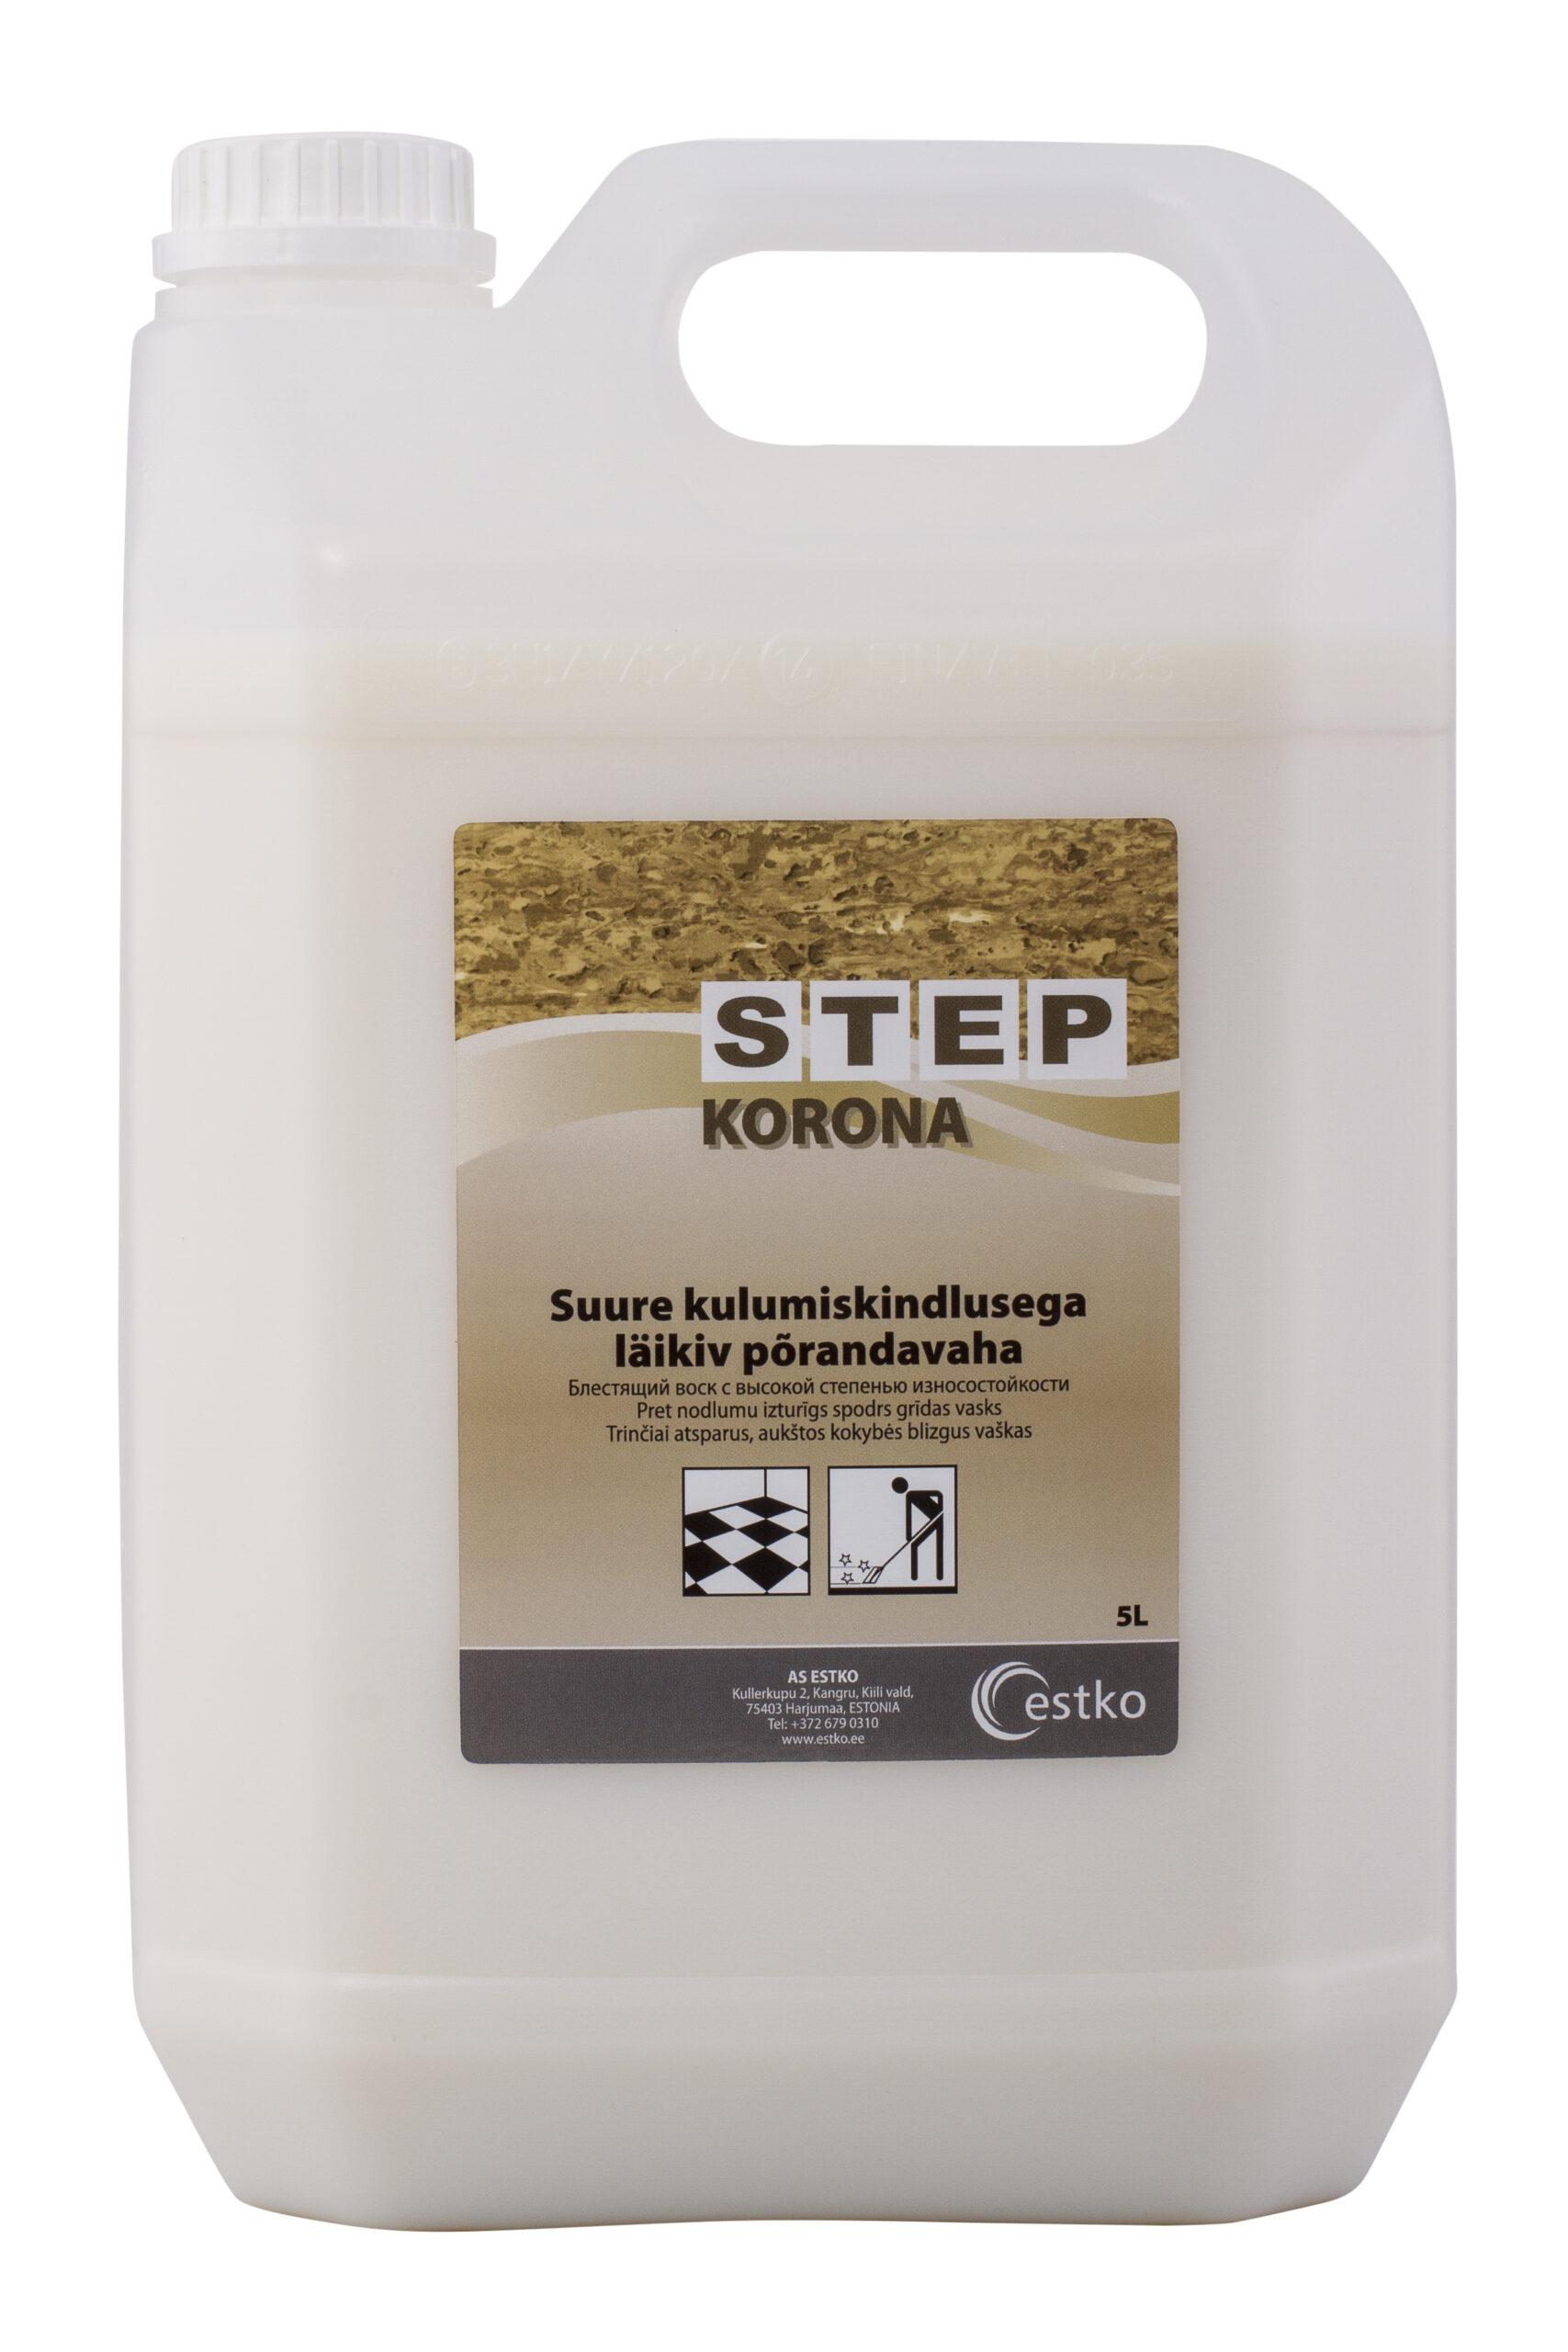 STEP Korona